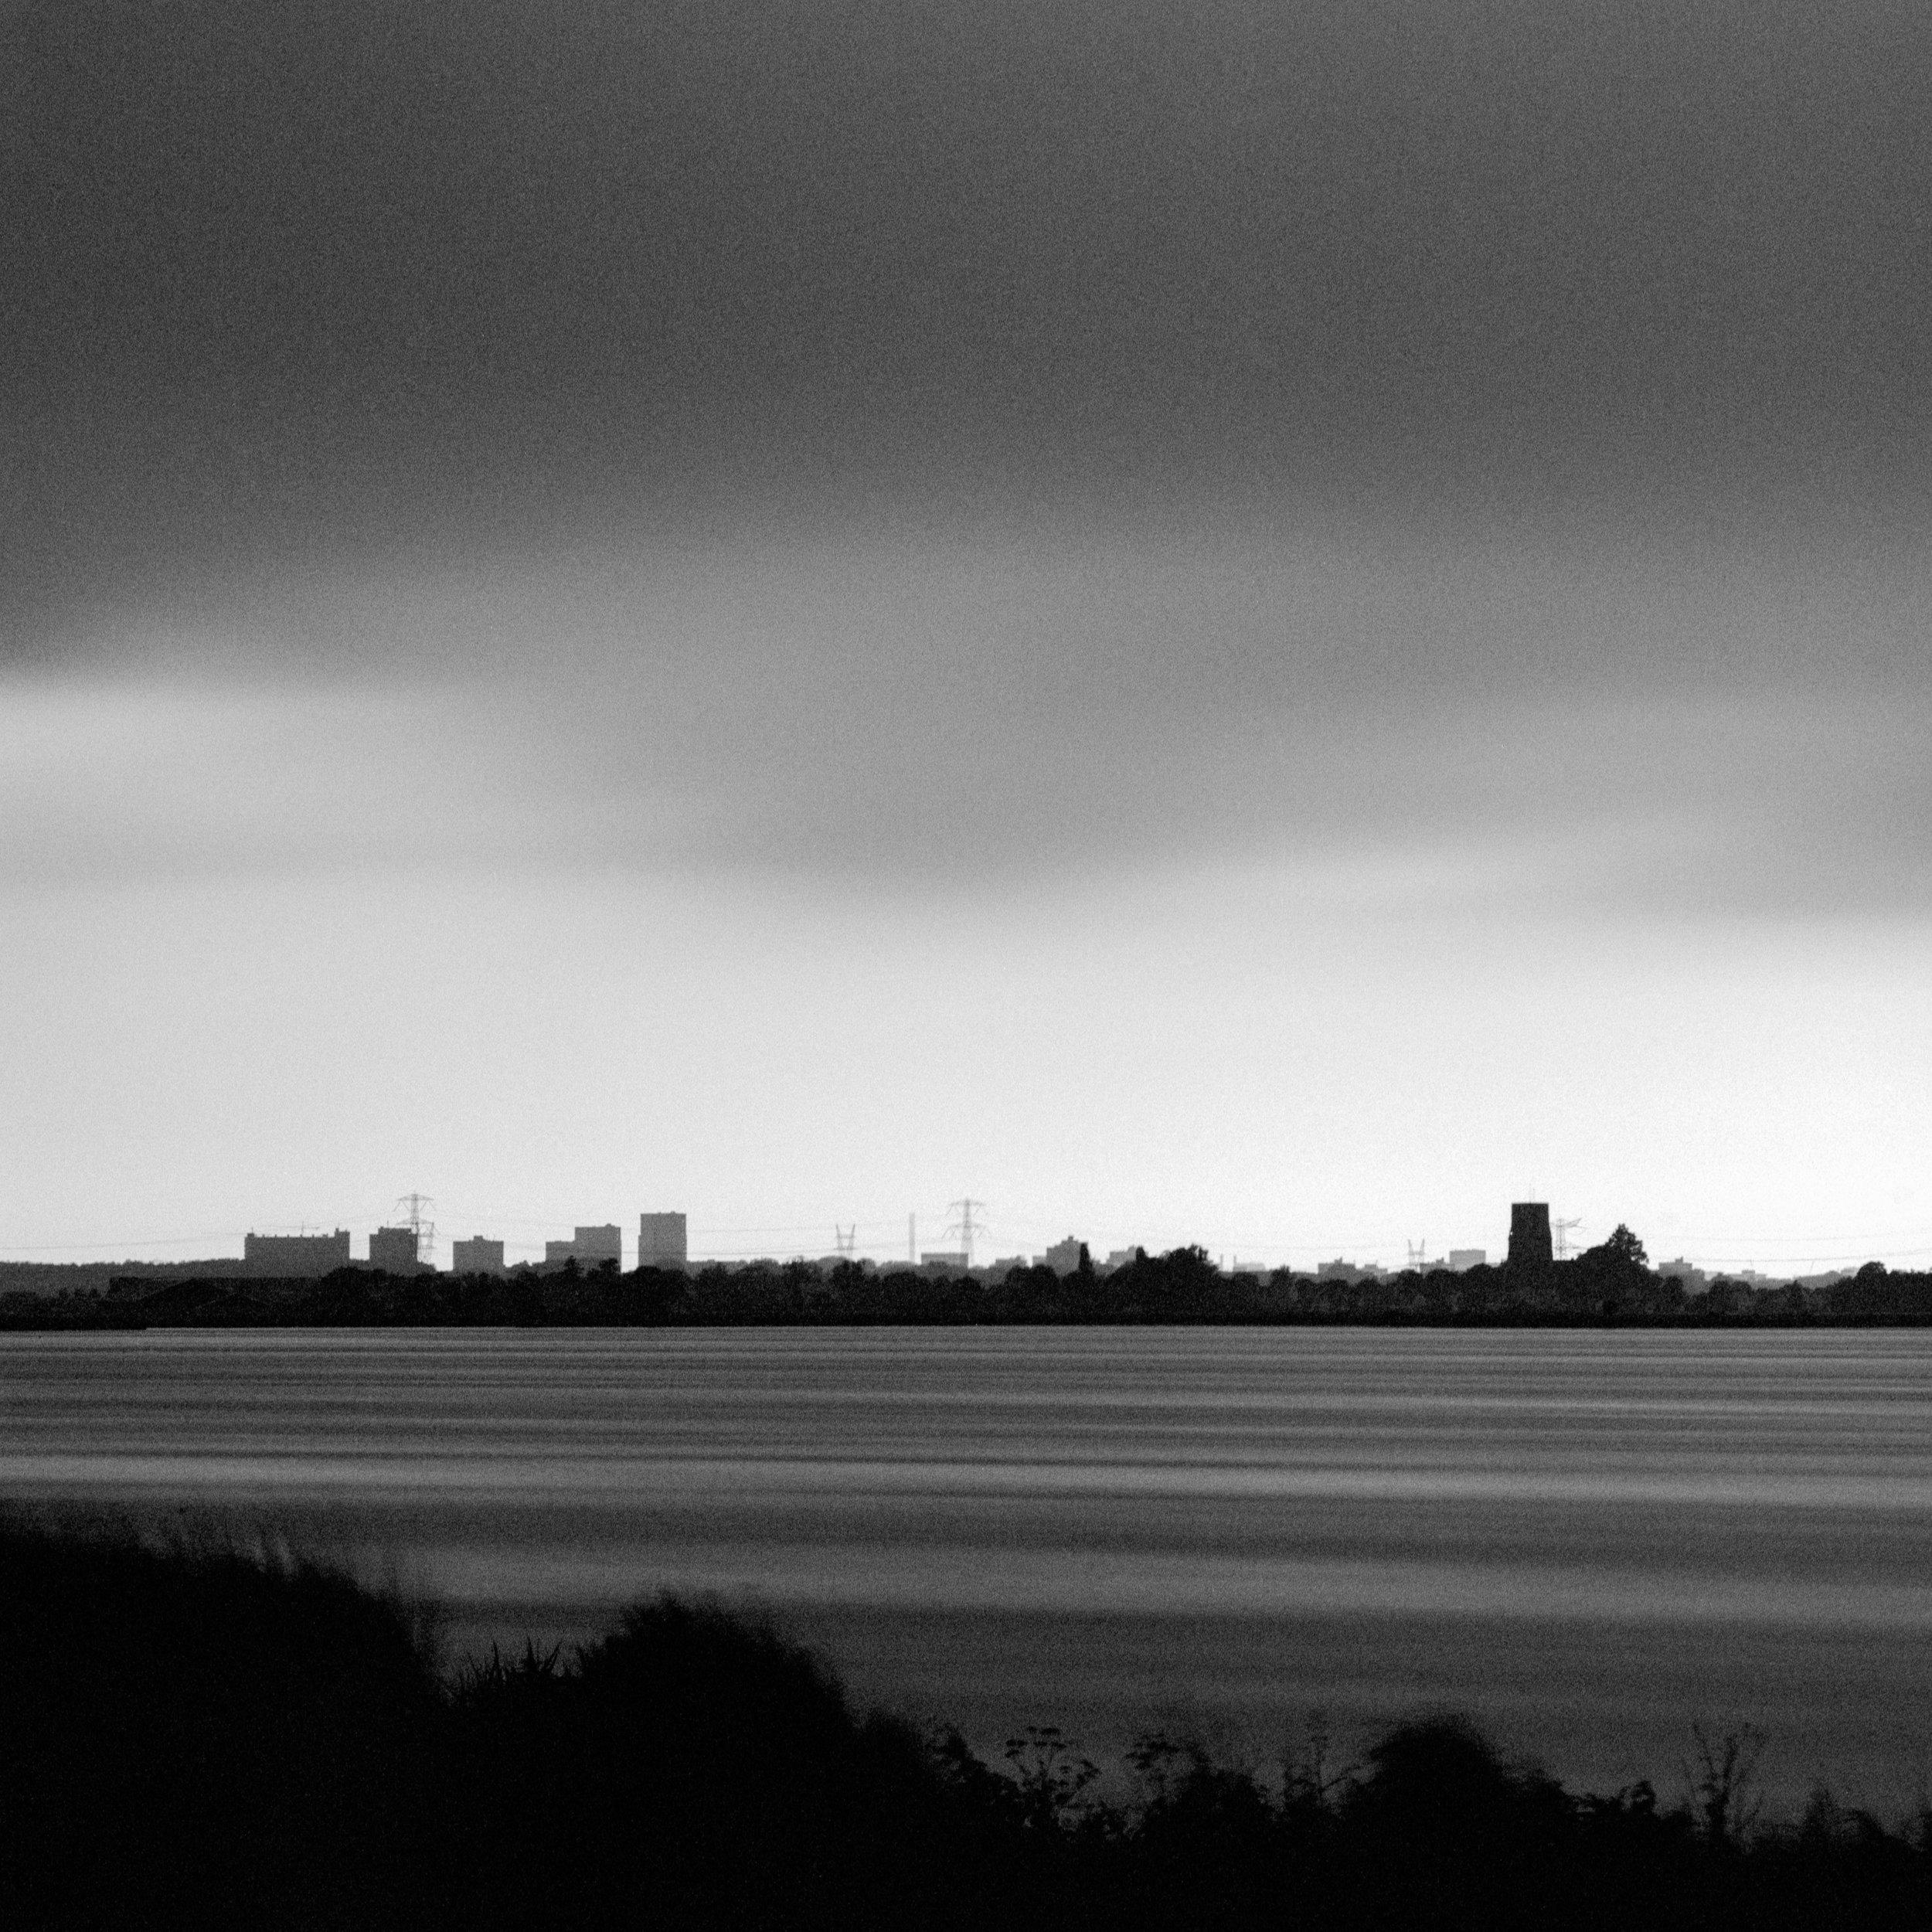 Week 22 - Uitdammerdijk - 003.jpg